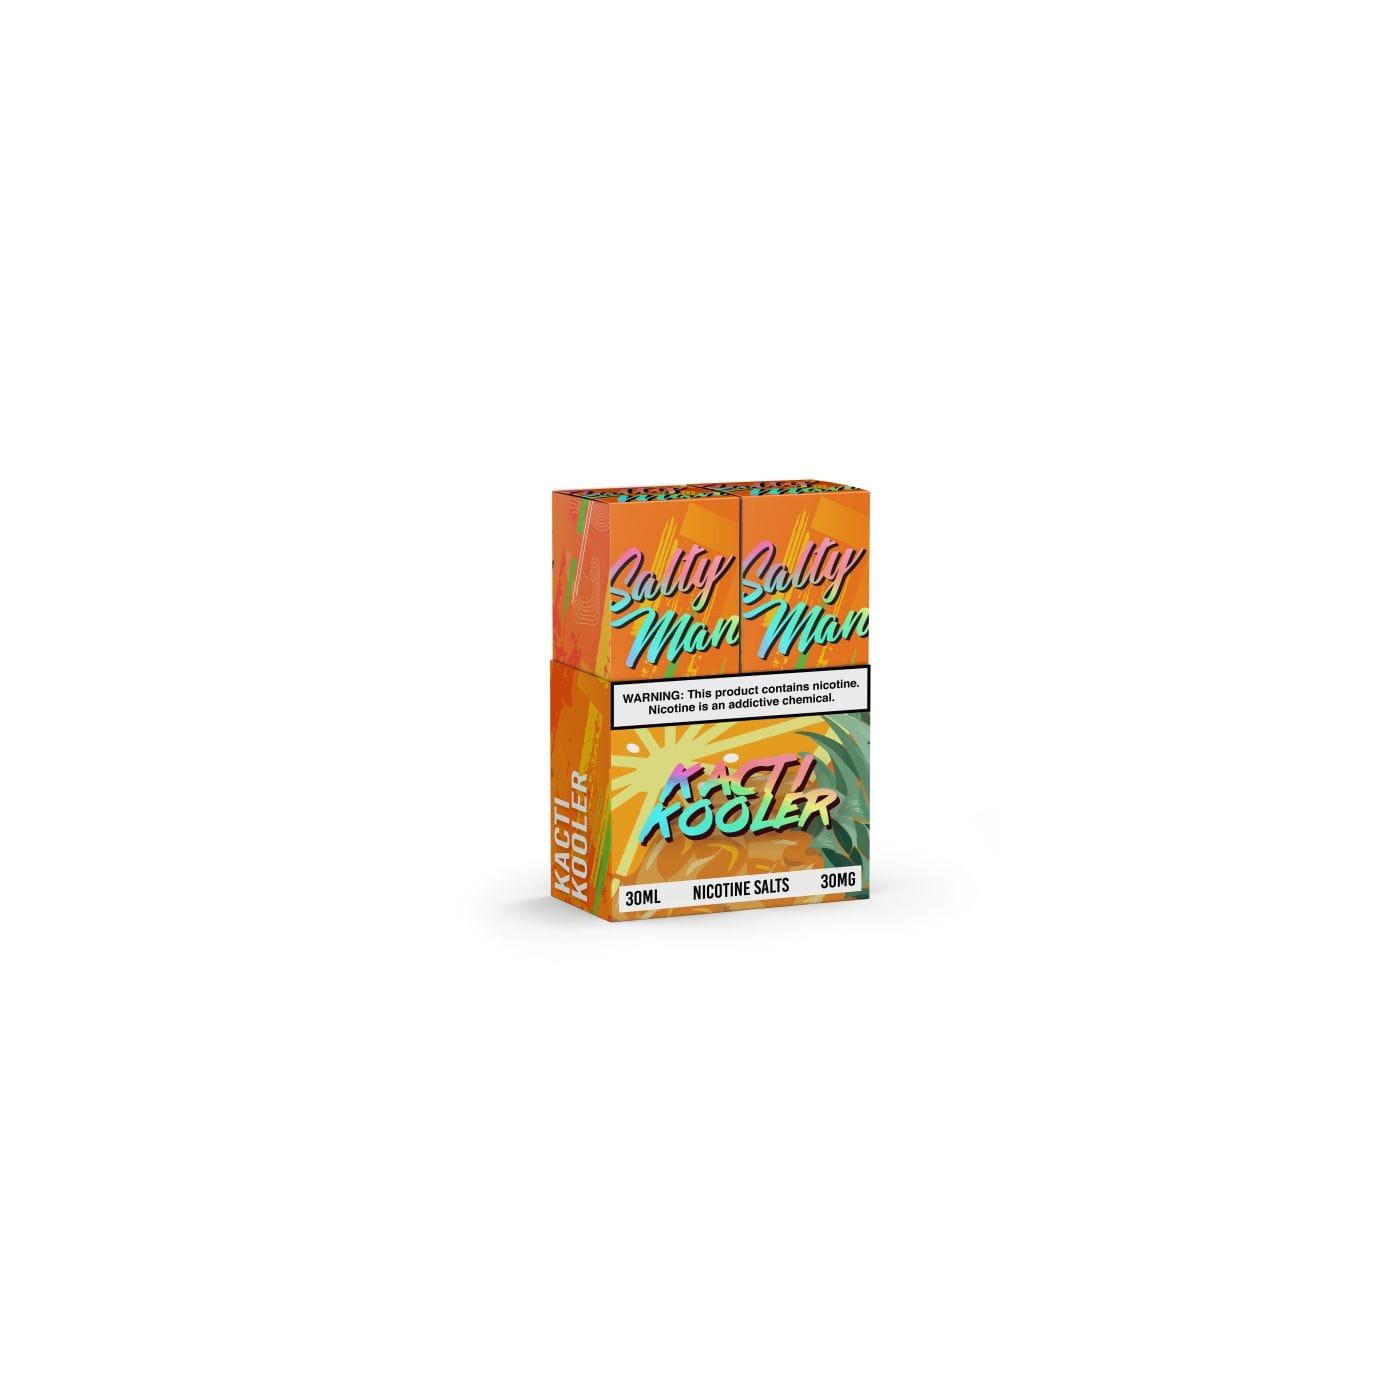 Salty Man Kacti Cooler - 2 Pack